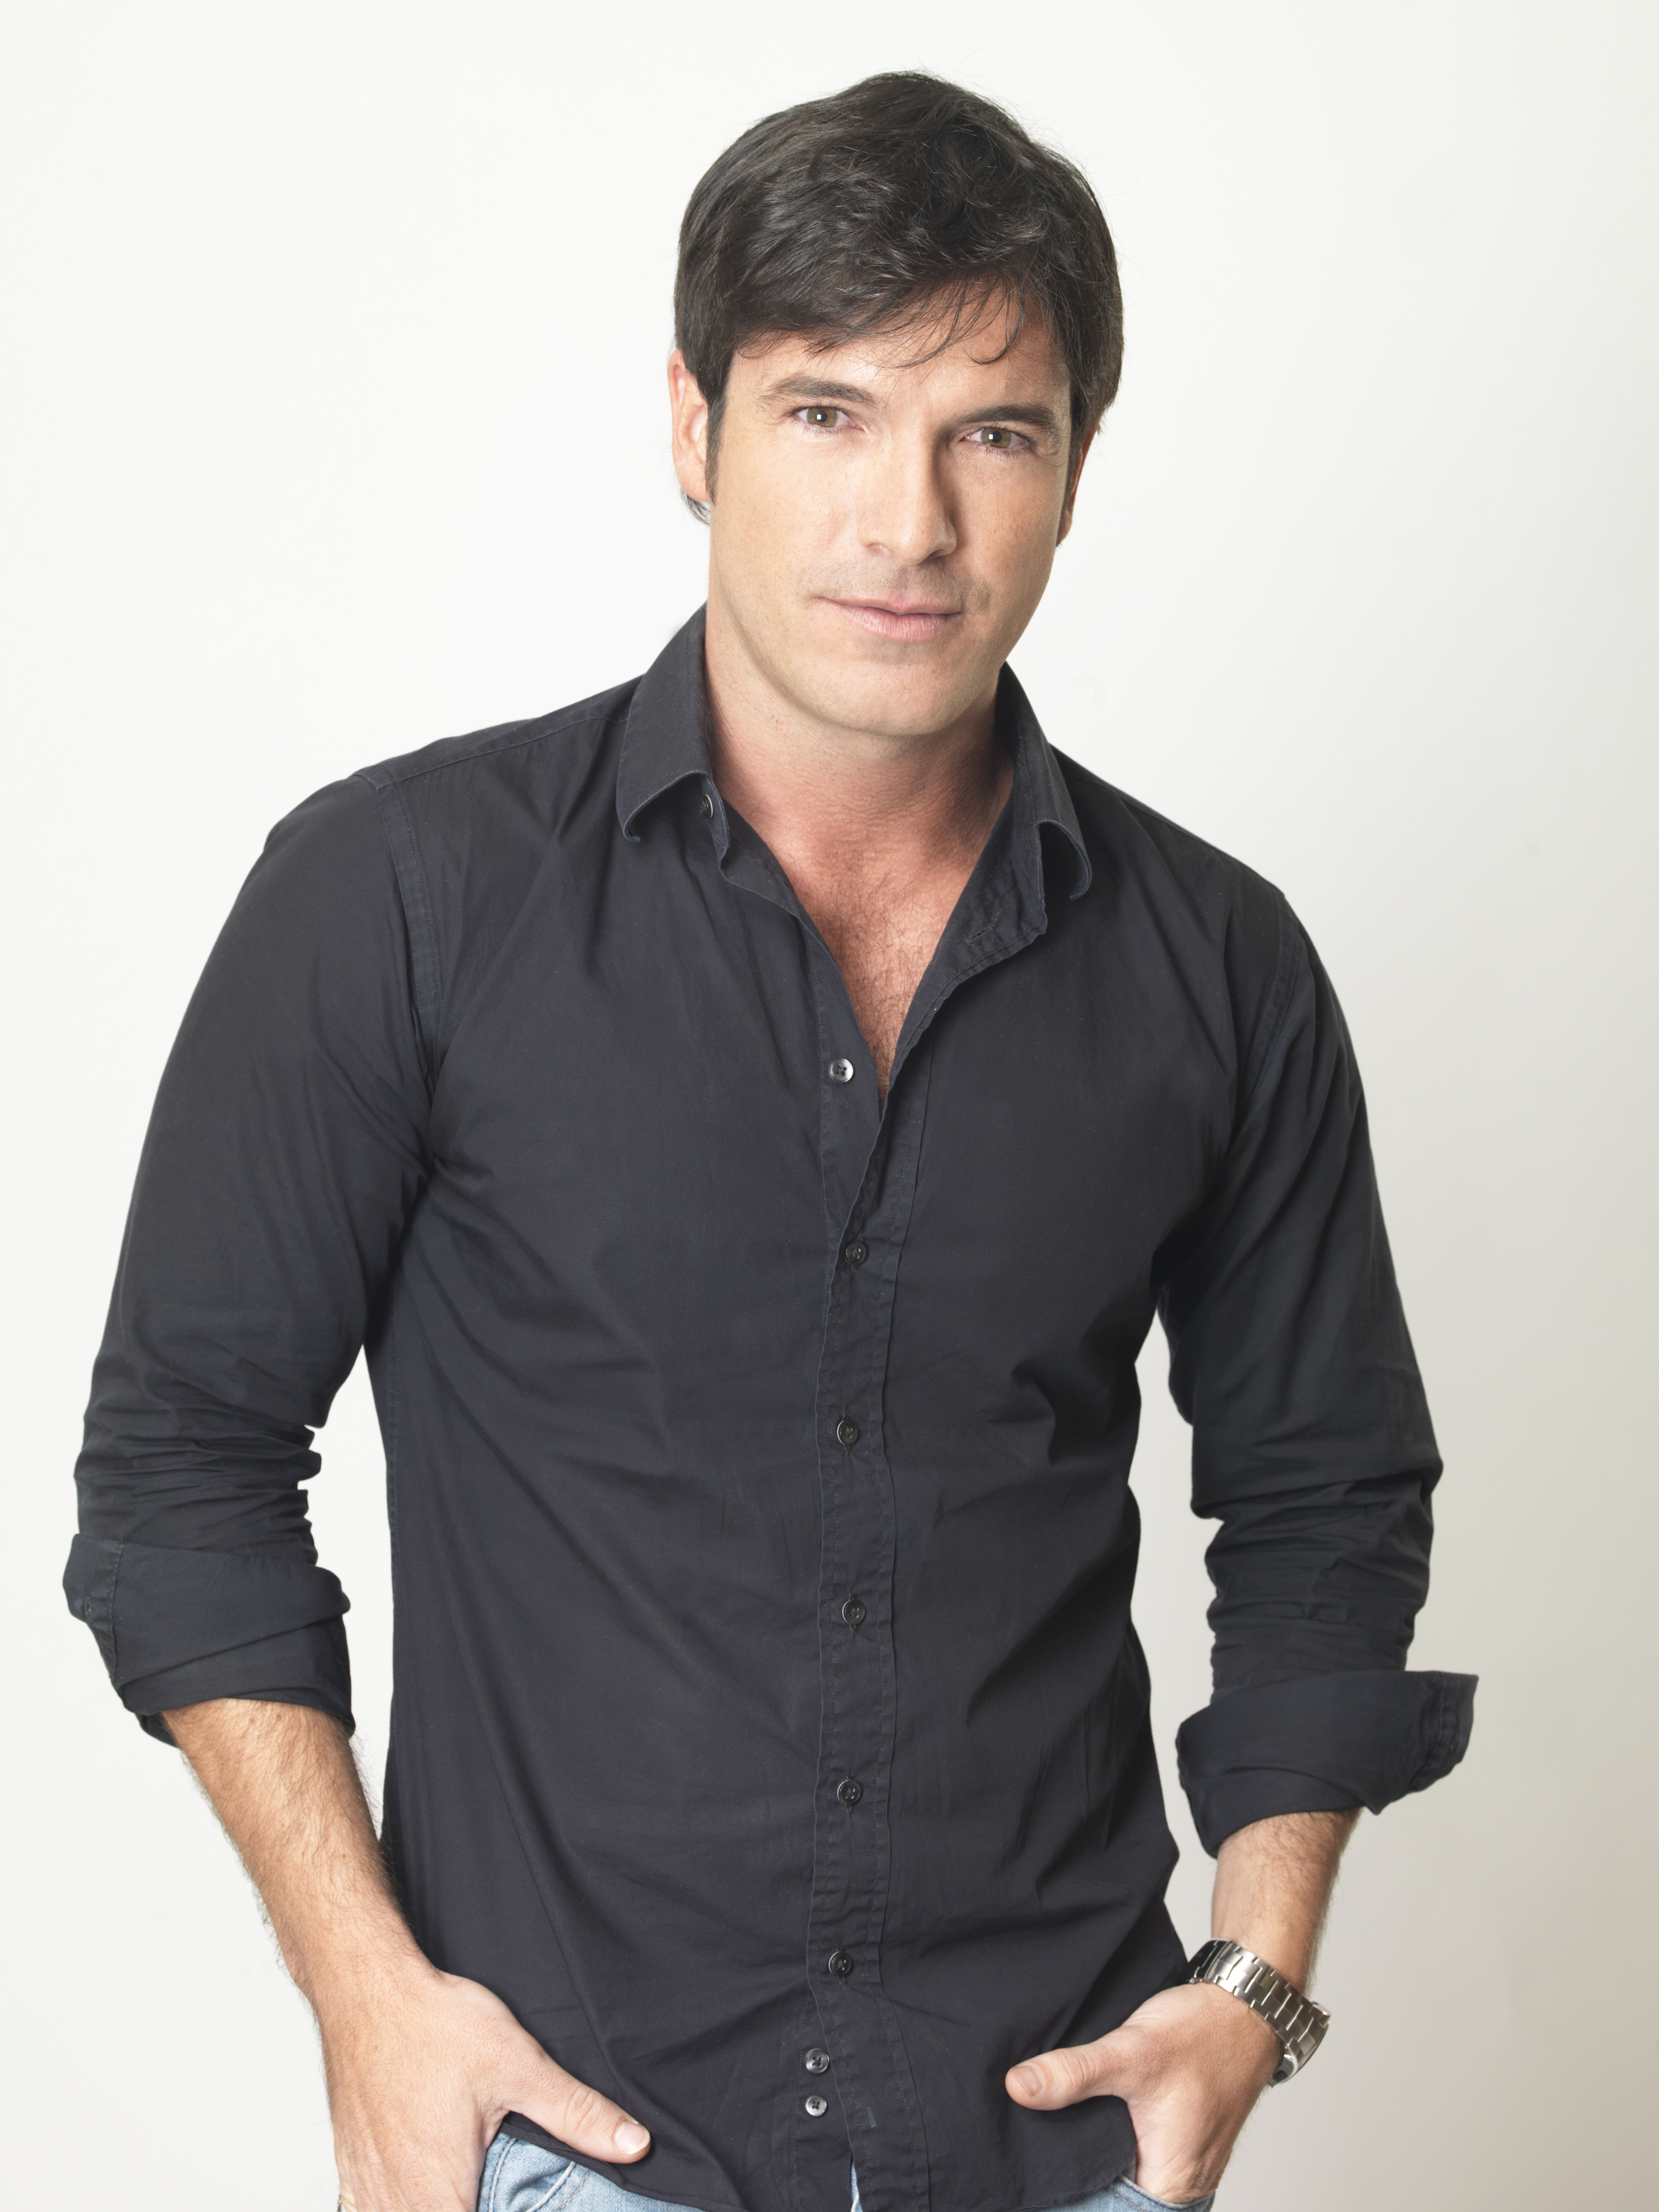 Marco de Paula como Gerardo Altamirano Jr. - Rosa Diamante Telemundo ...